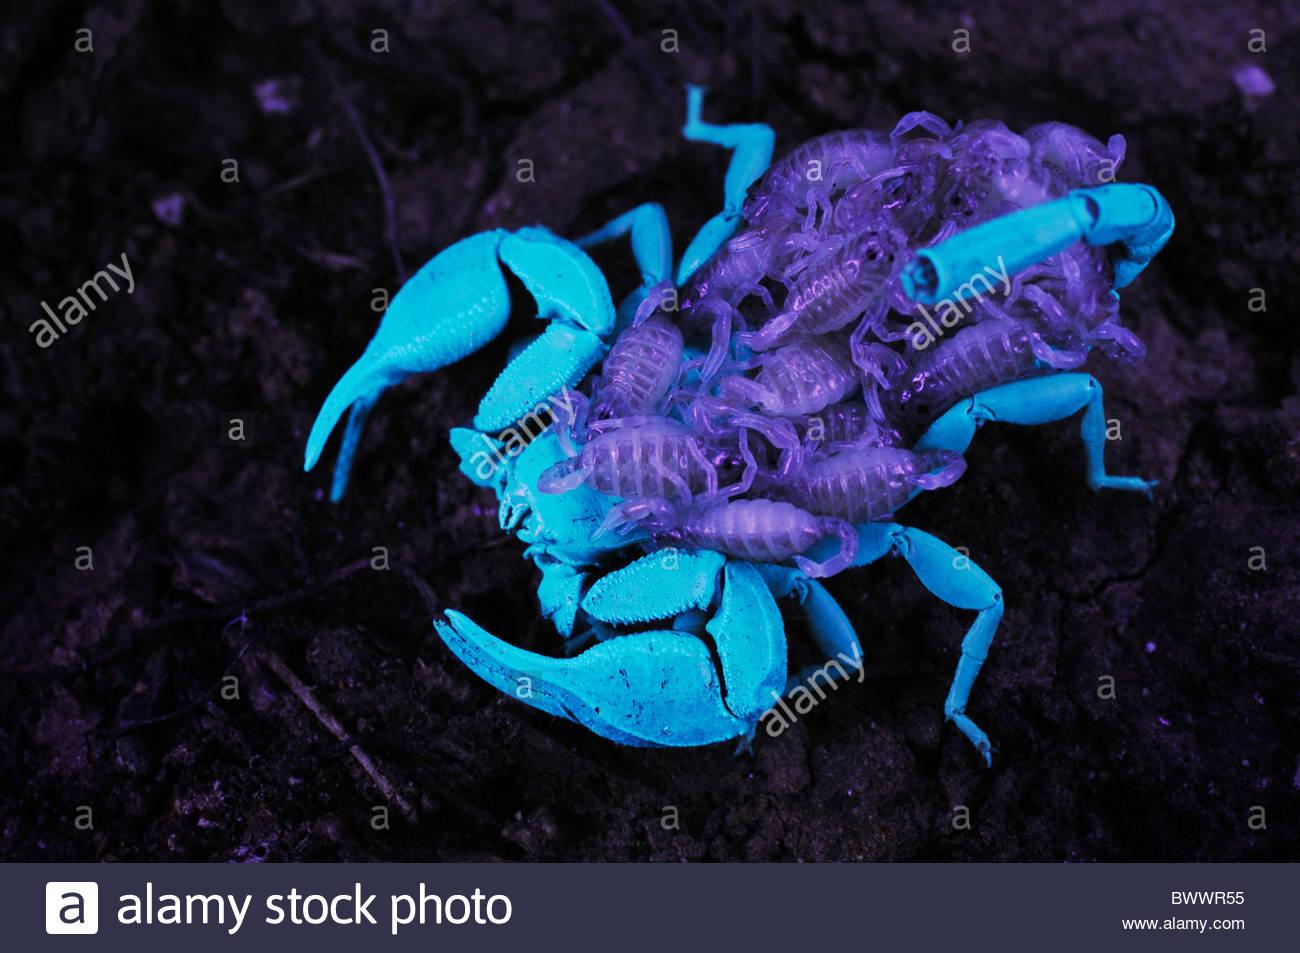 Wood Scorpion Stock Photos & Wood Scorpion Stock Images.